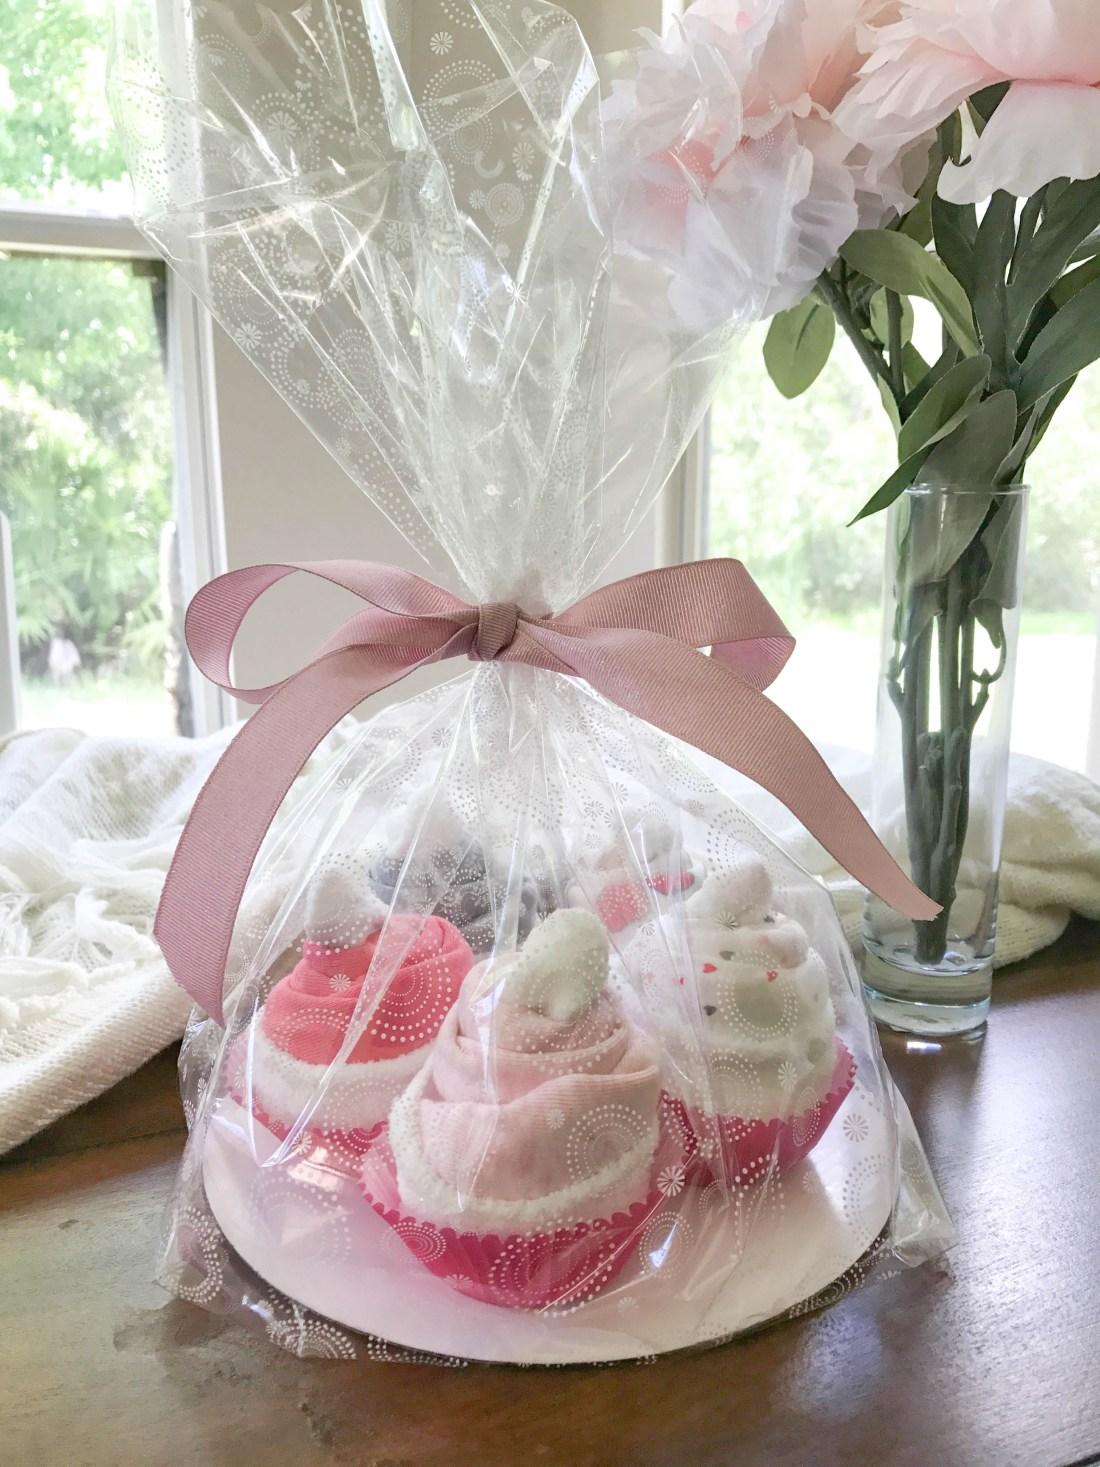 DIY baby shower gift idea